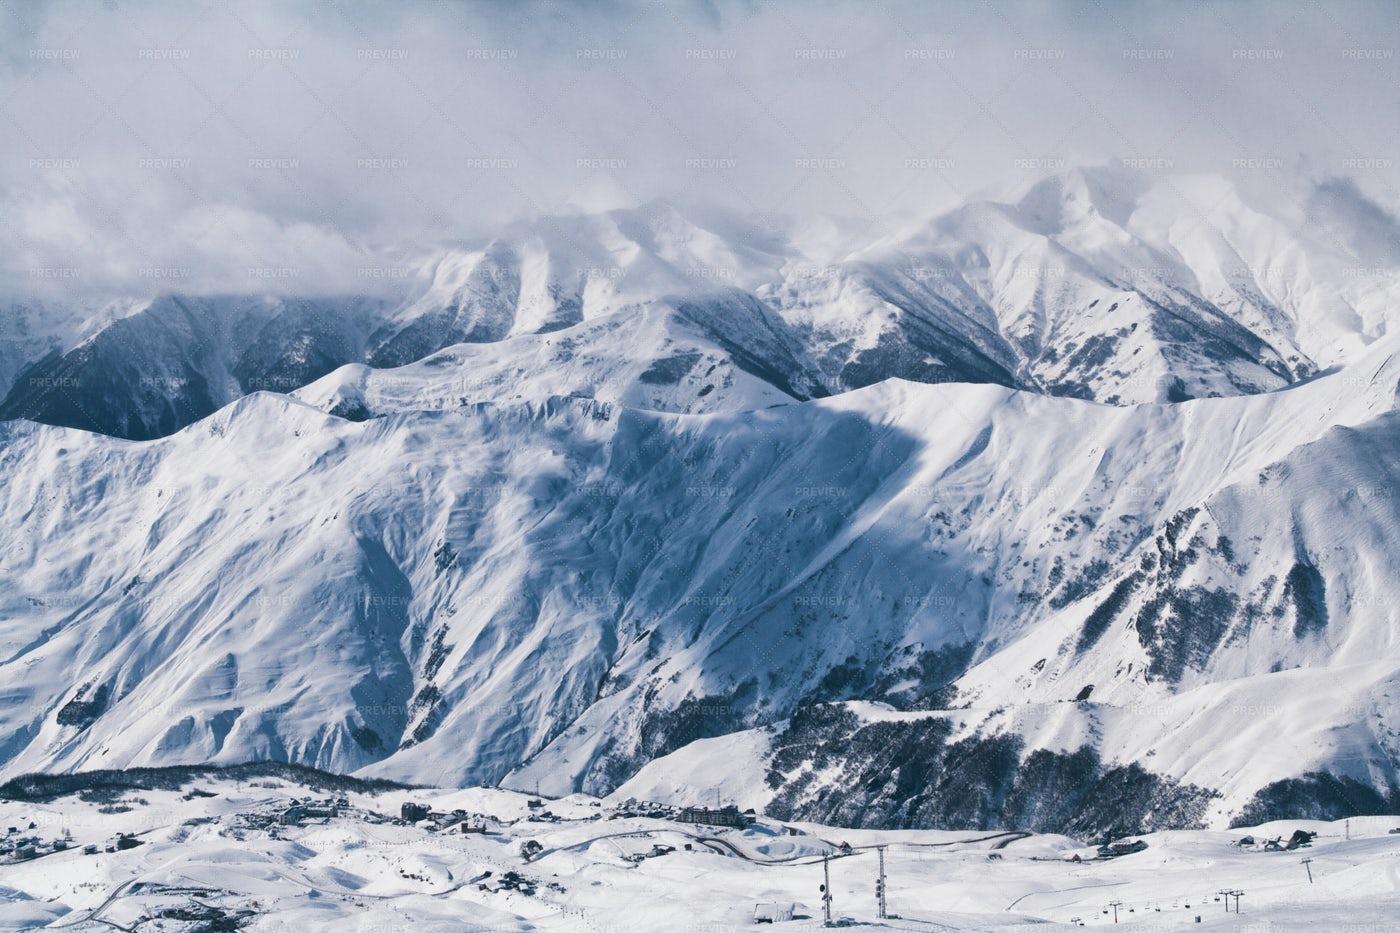 Winter Ski Resort In The Mountain: Stock Photos